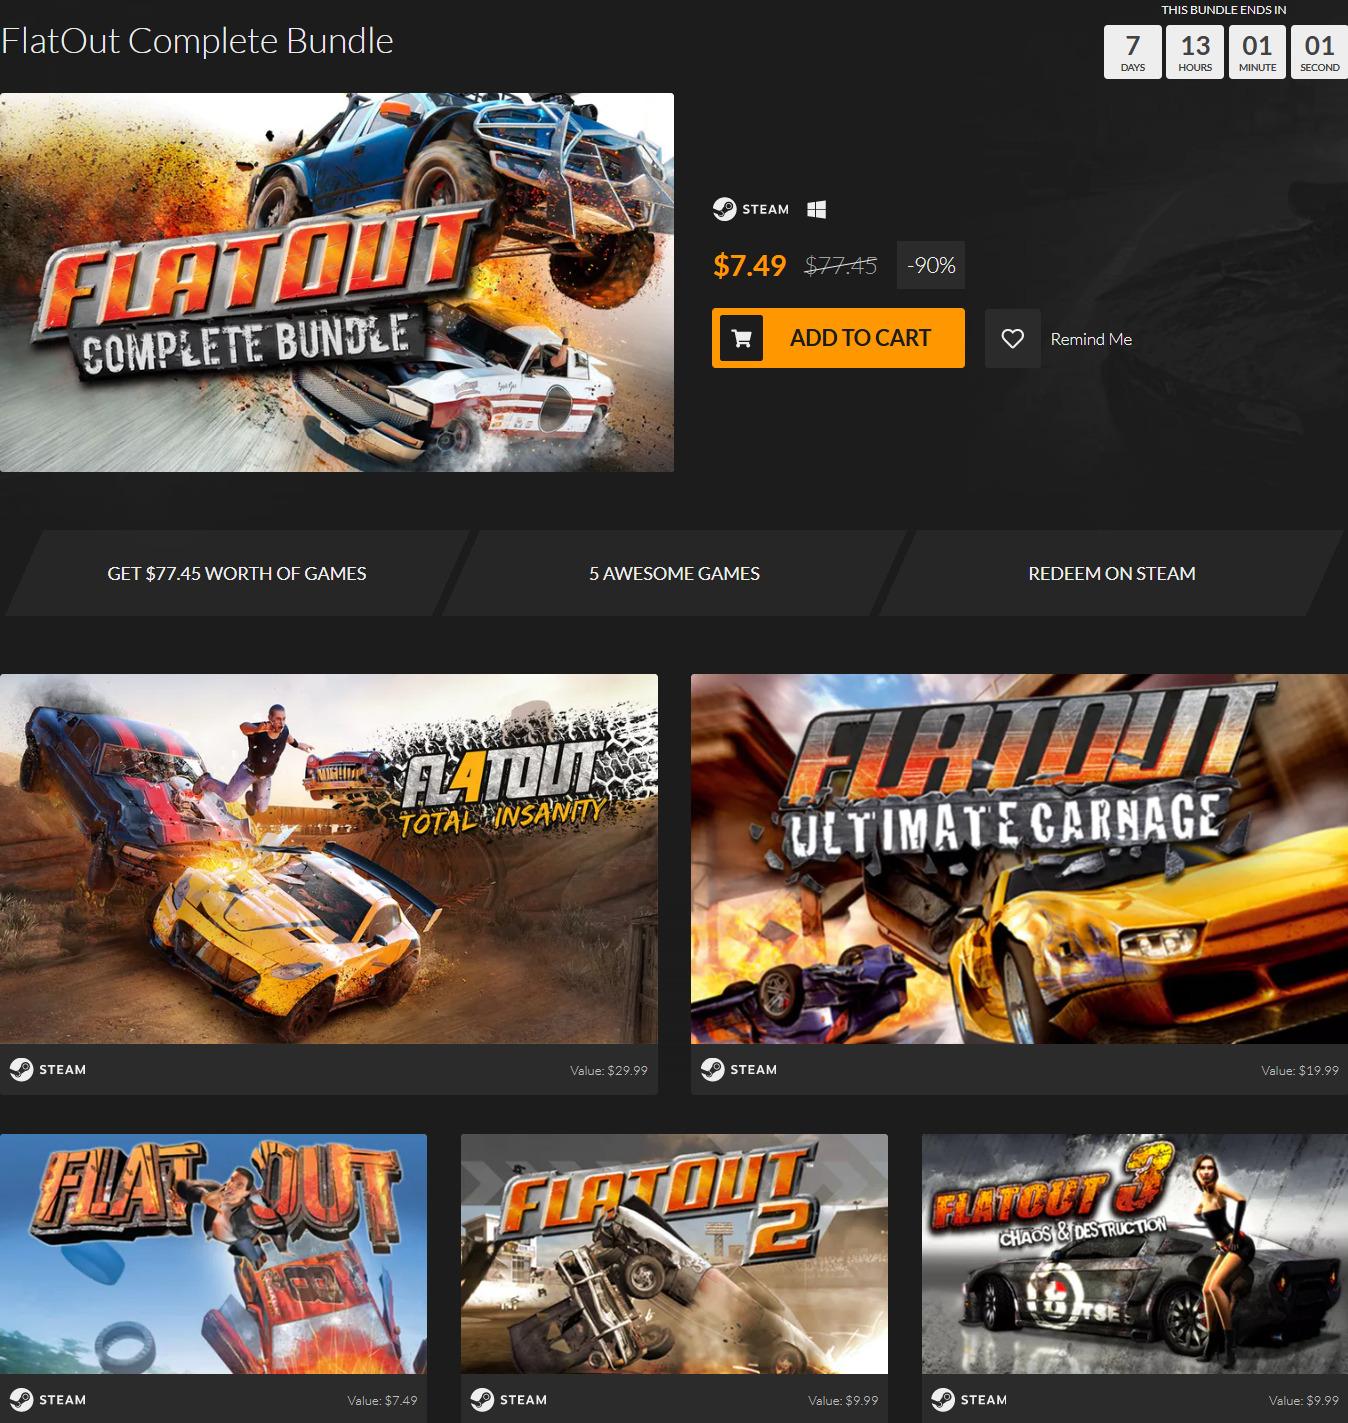 Screenshot_2019-03-28 FlatOut Complete Bundle Steam Game Bundle Fanatical.jpg